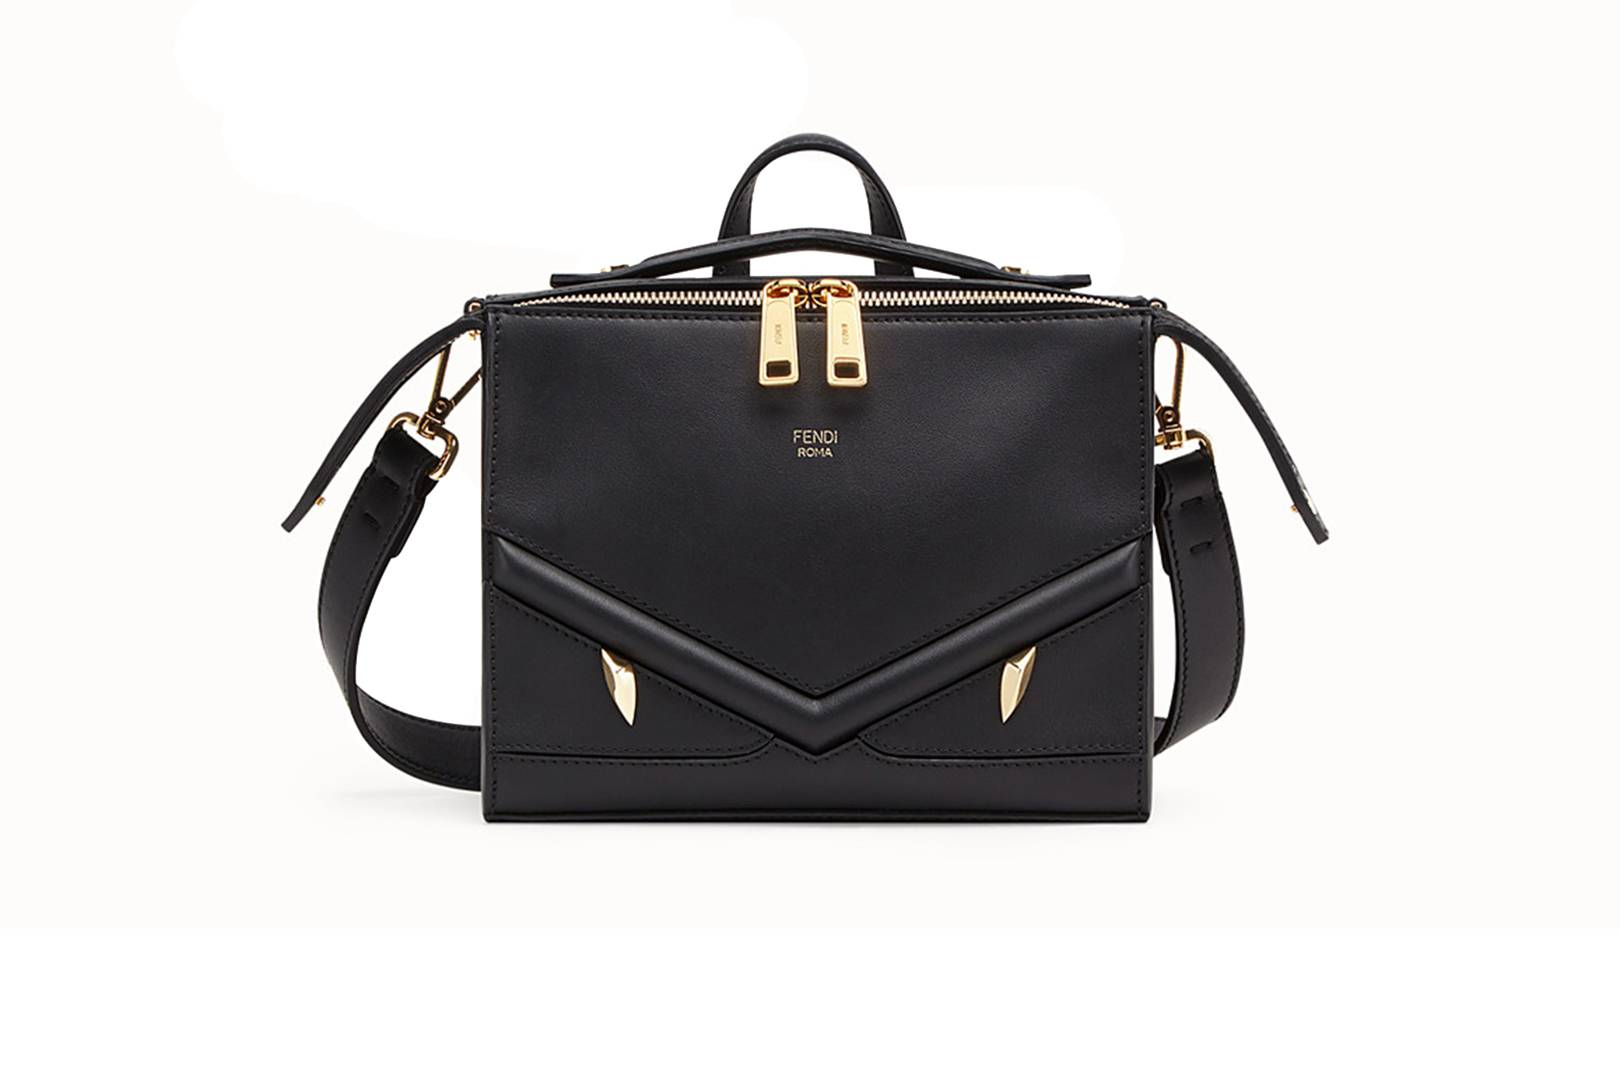 c73186a2a56d Make like Anwar Hadid and invest in a handbag | British GQ